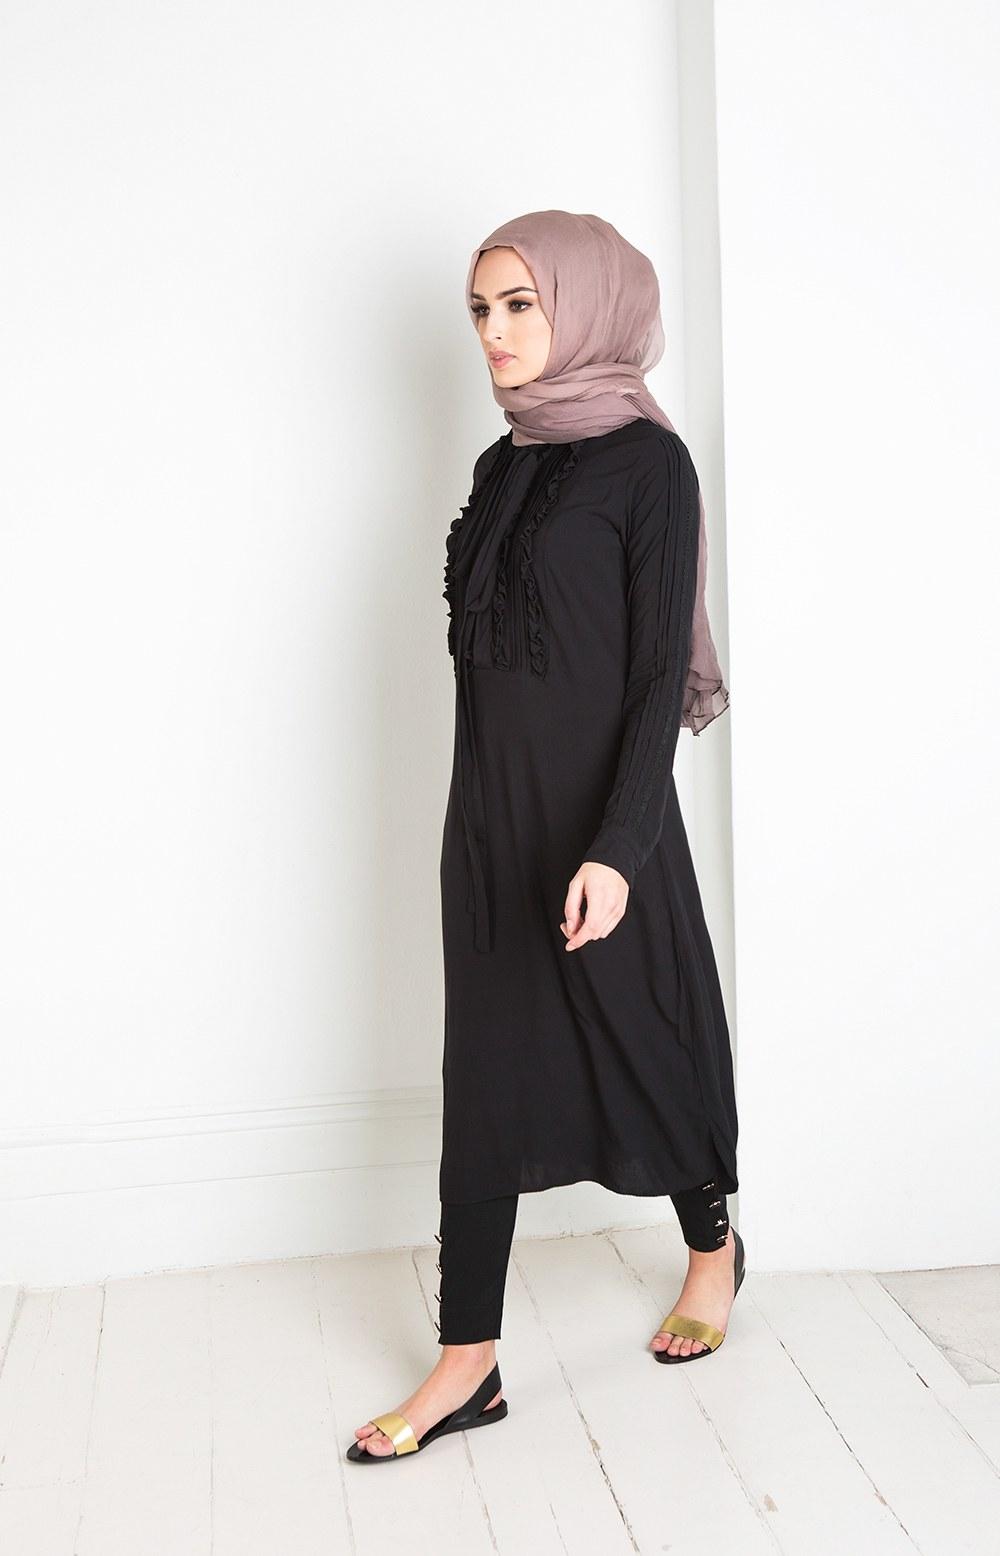 Design Baju Lebaran Wanita Jxdu 25 Trend Model Baju Muslim Lebaran 2017 Simple Modis